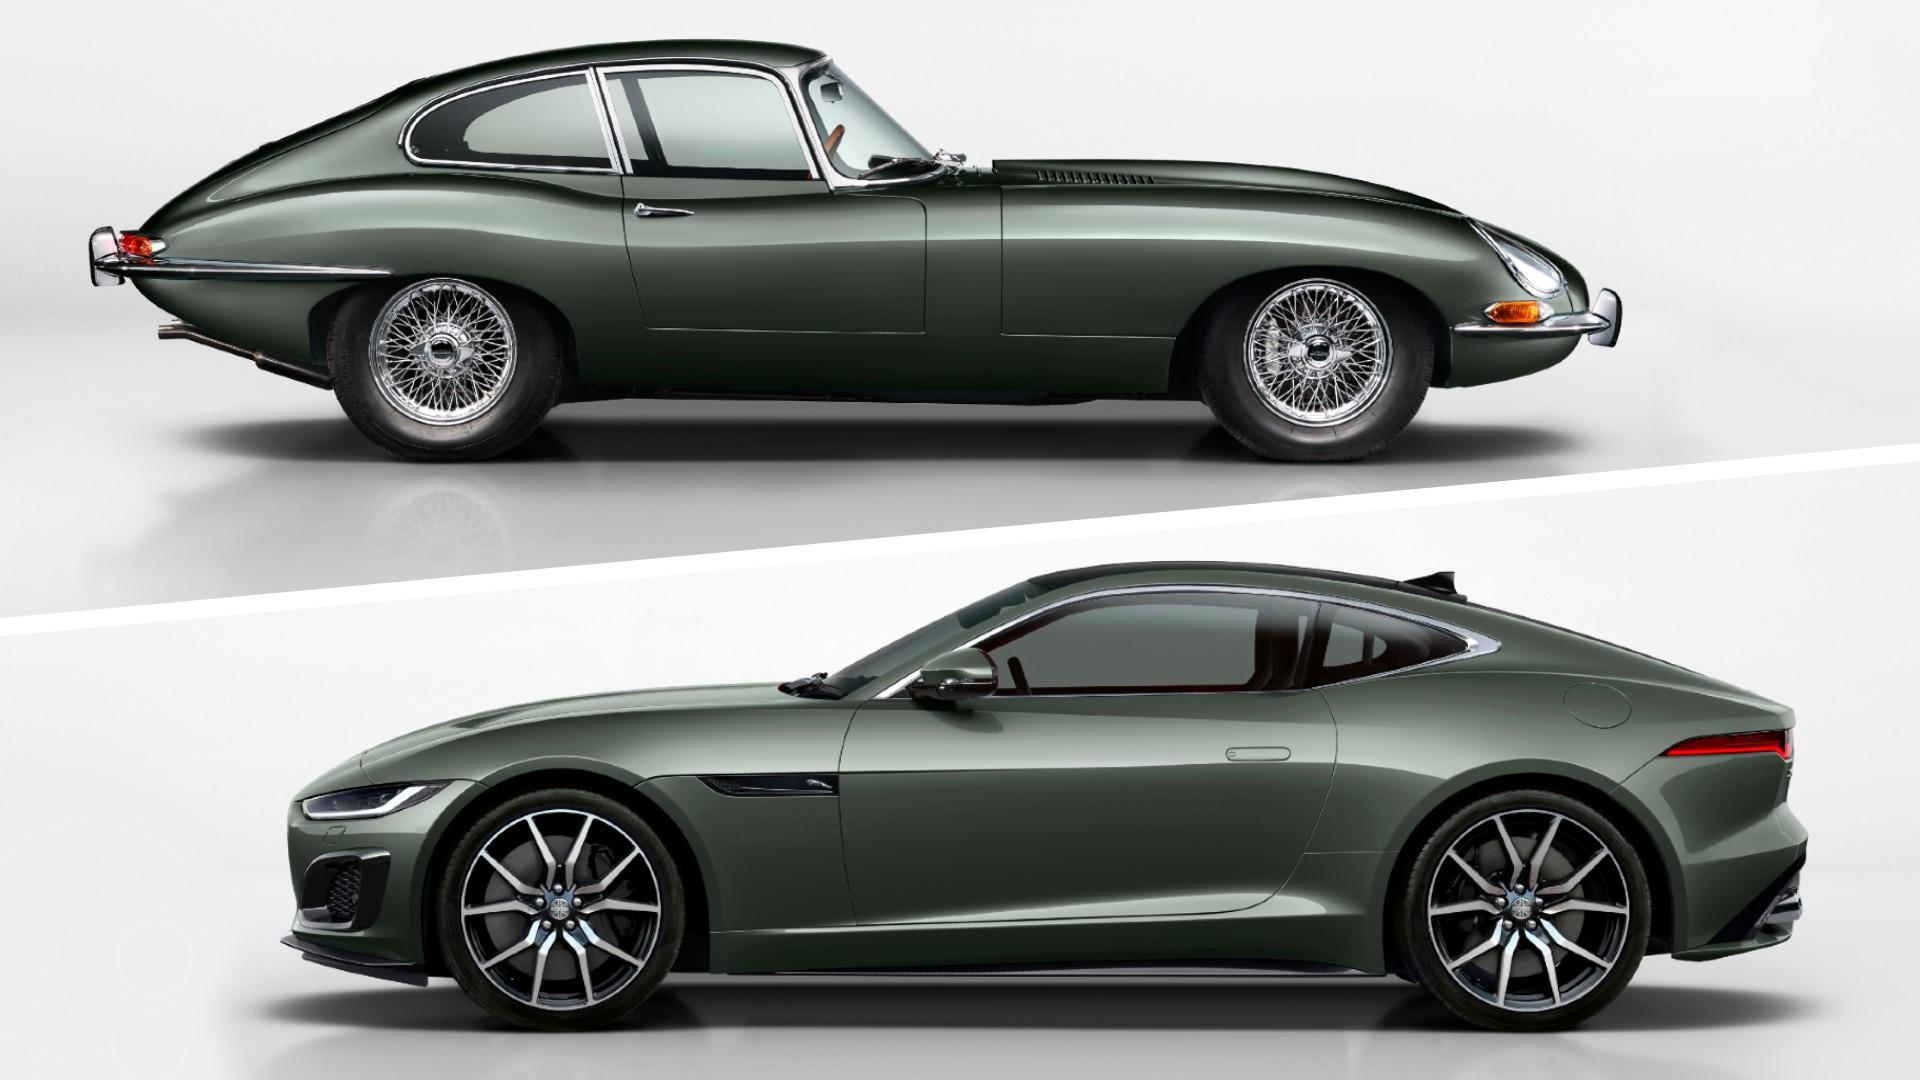 Jaguar F-Type Heritage 60: Επετειακή έκδοση με άρωμα E-Type